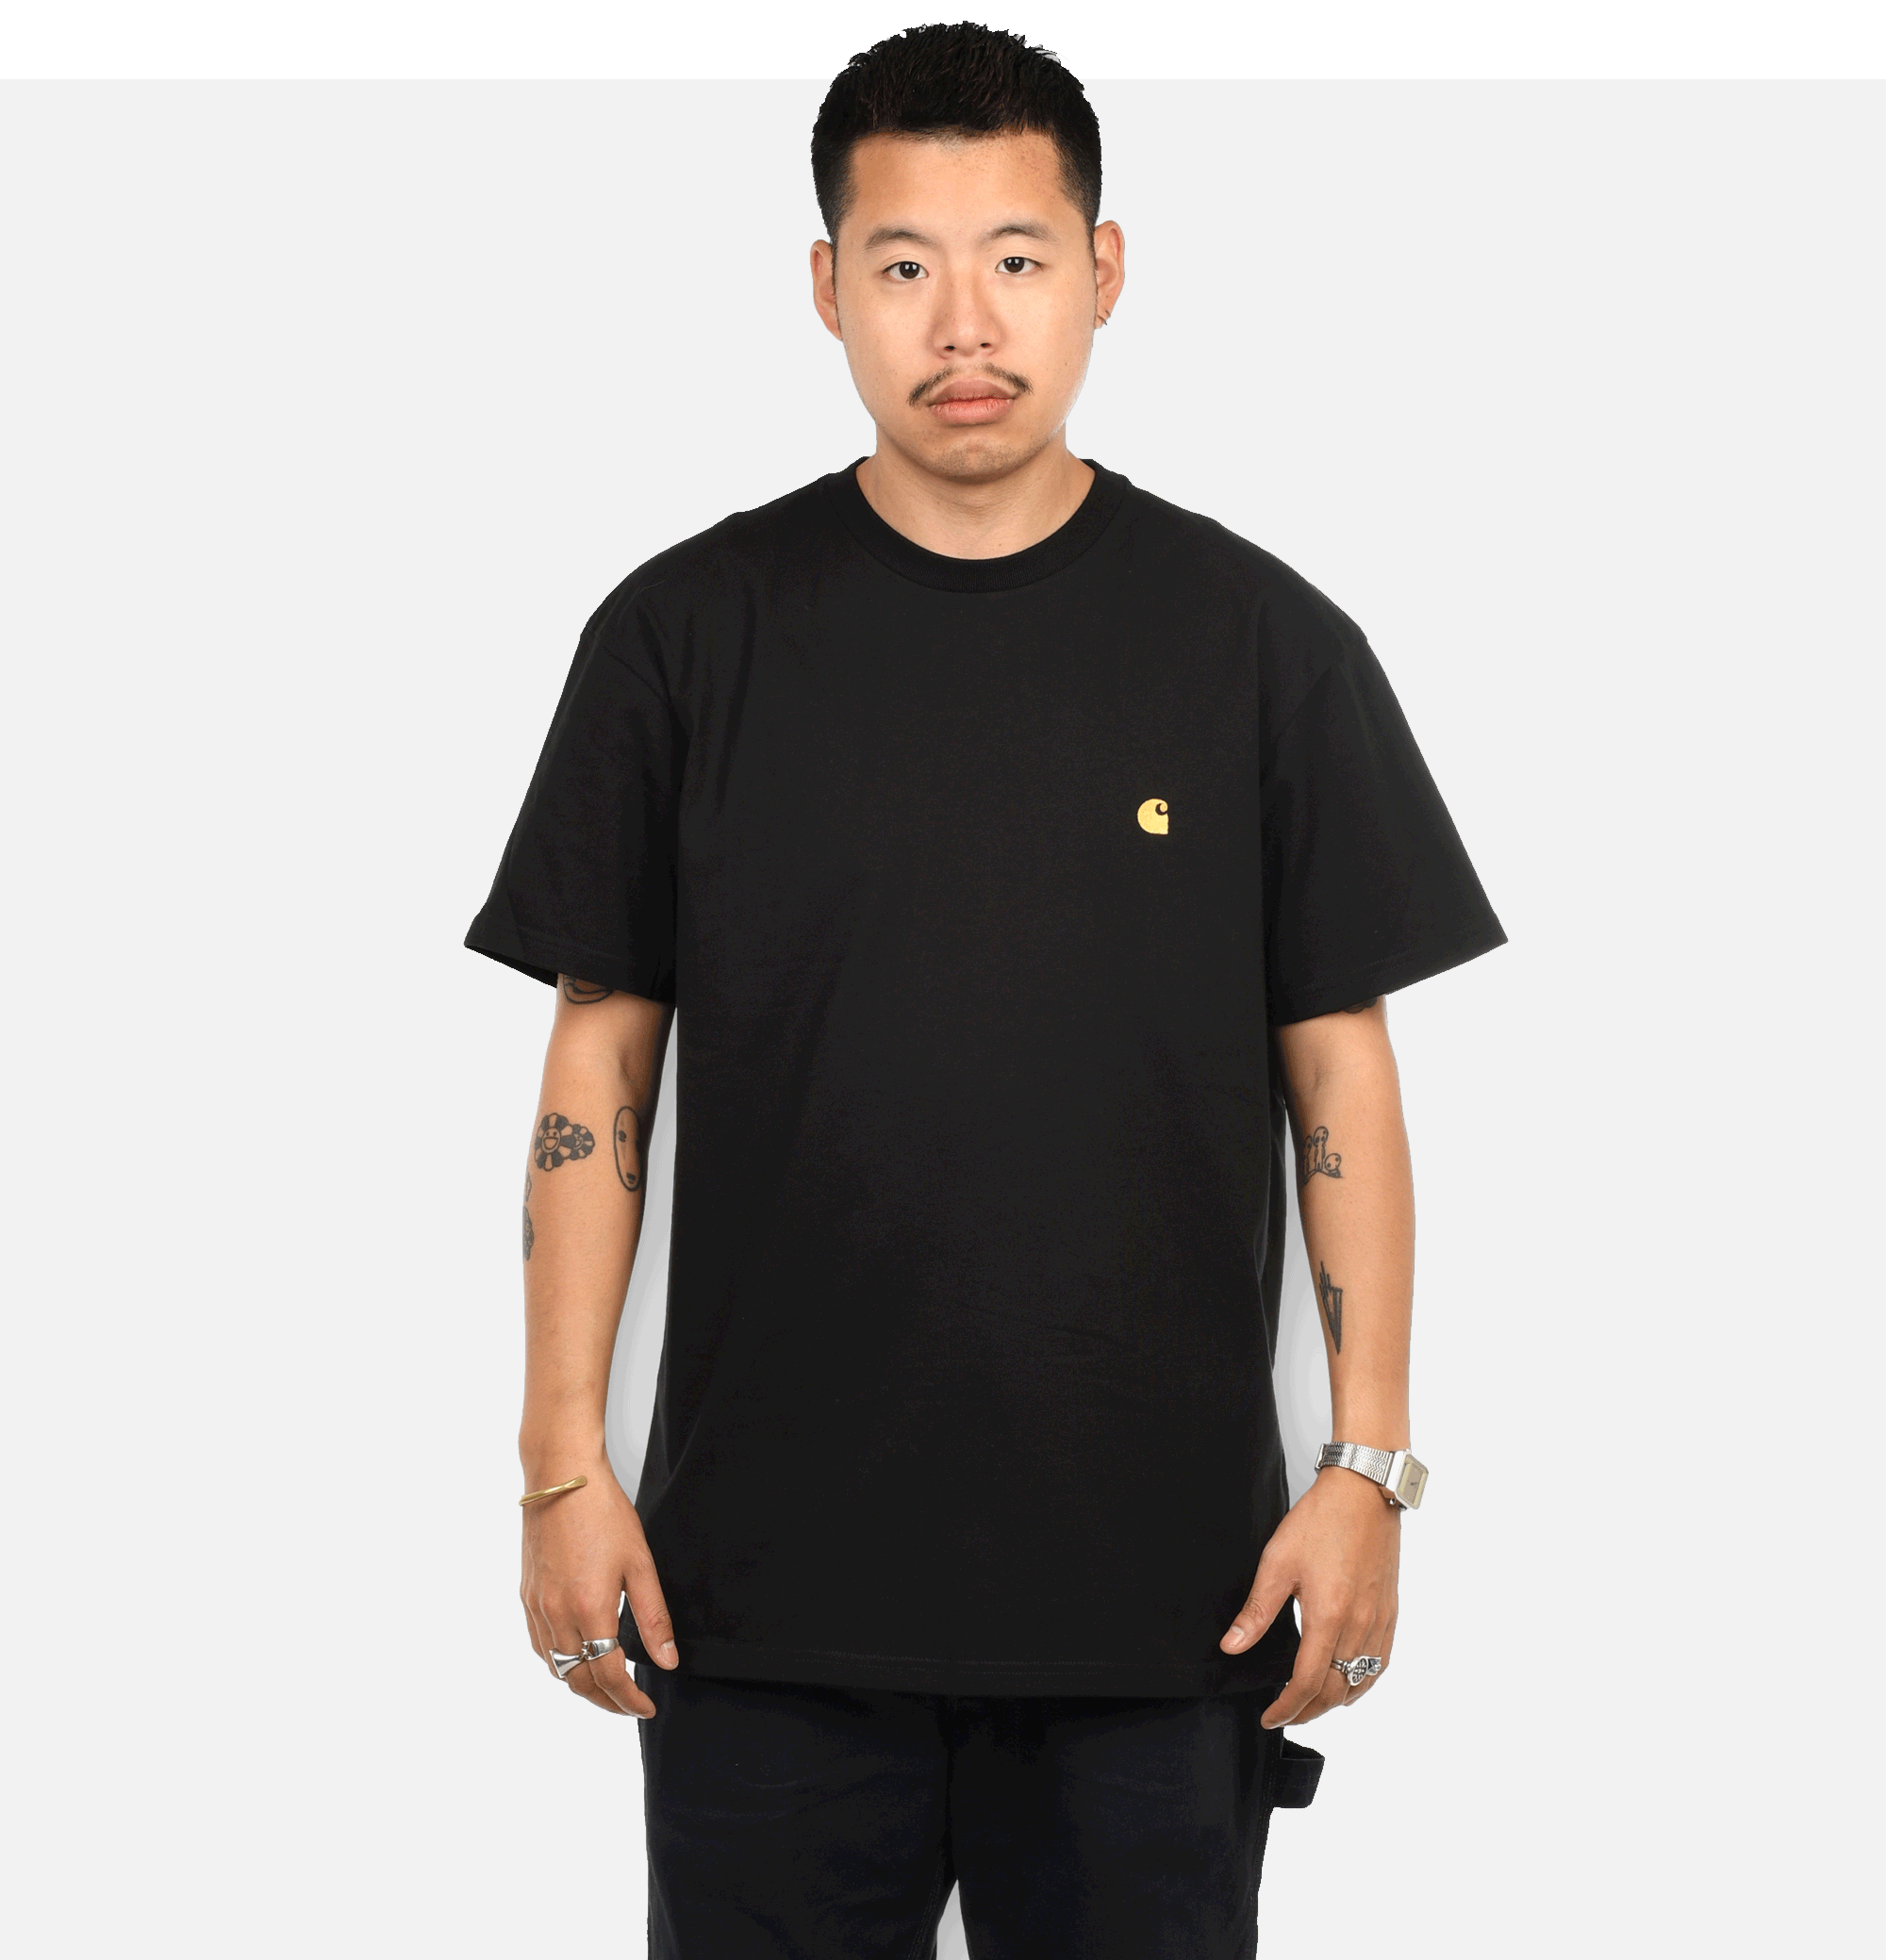 Chase T-shirt Black